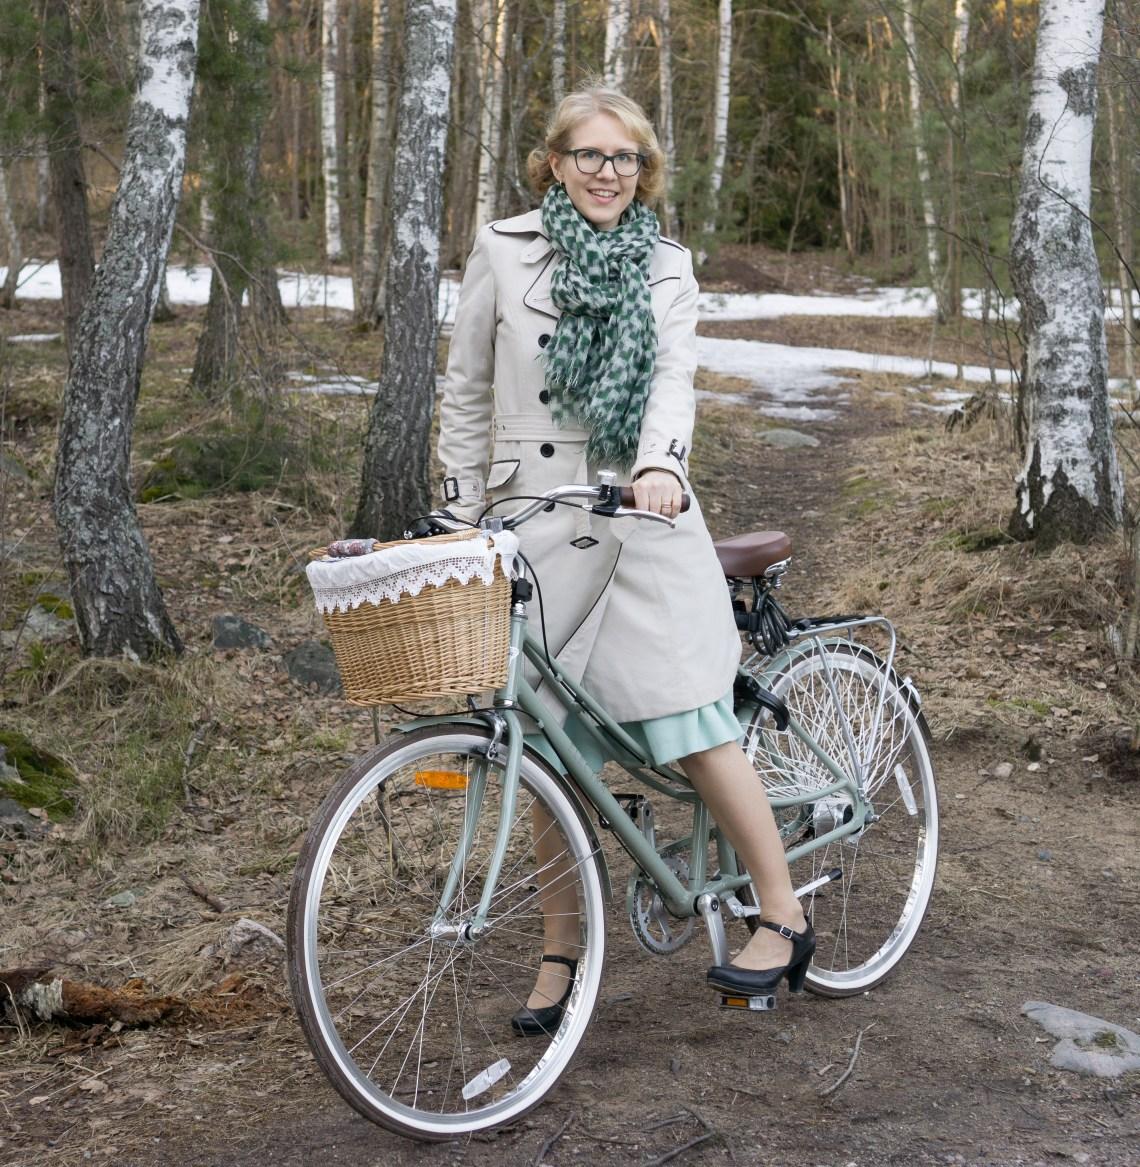 Pinm your bike